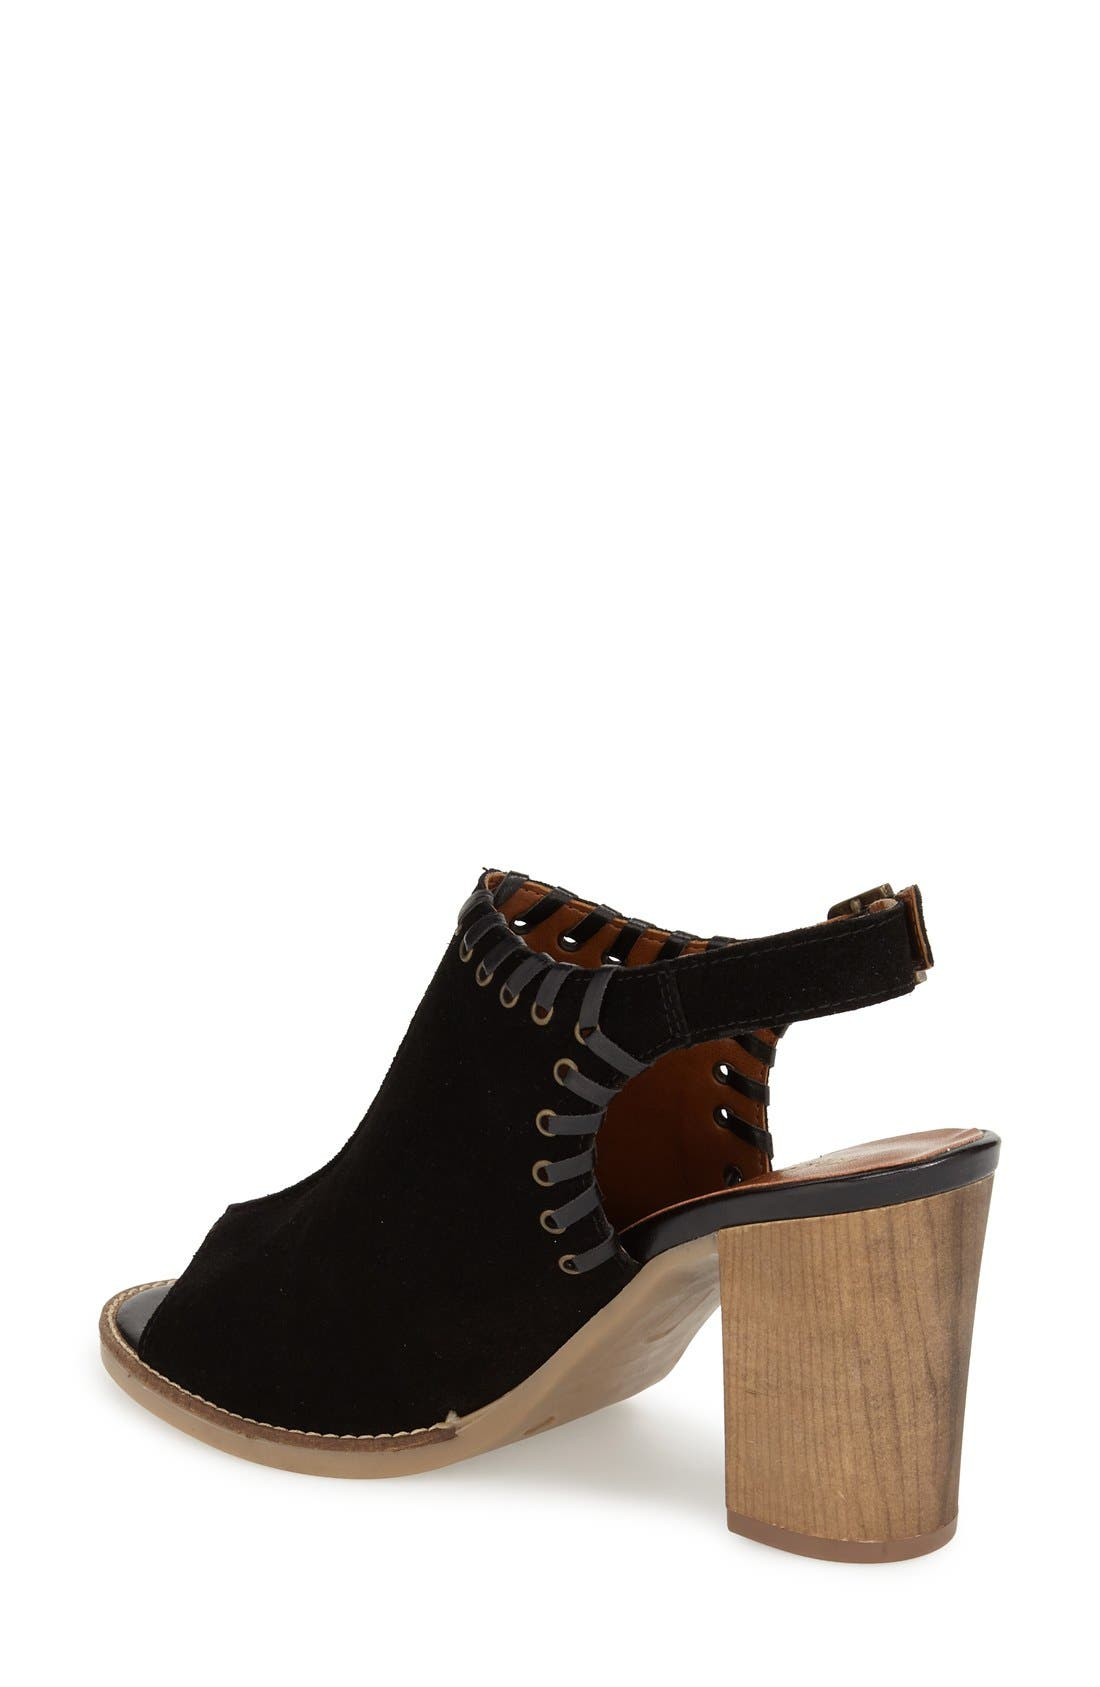 'Ora' Block Heel Slingback Sandal,                             Alternate thumbnail 2, color,                             Black Suede